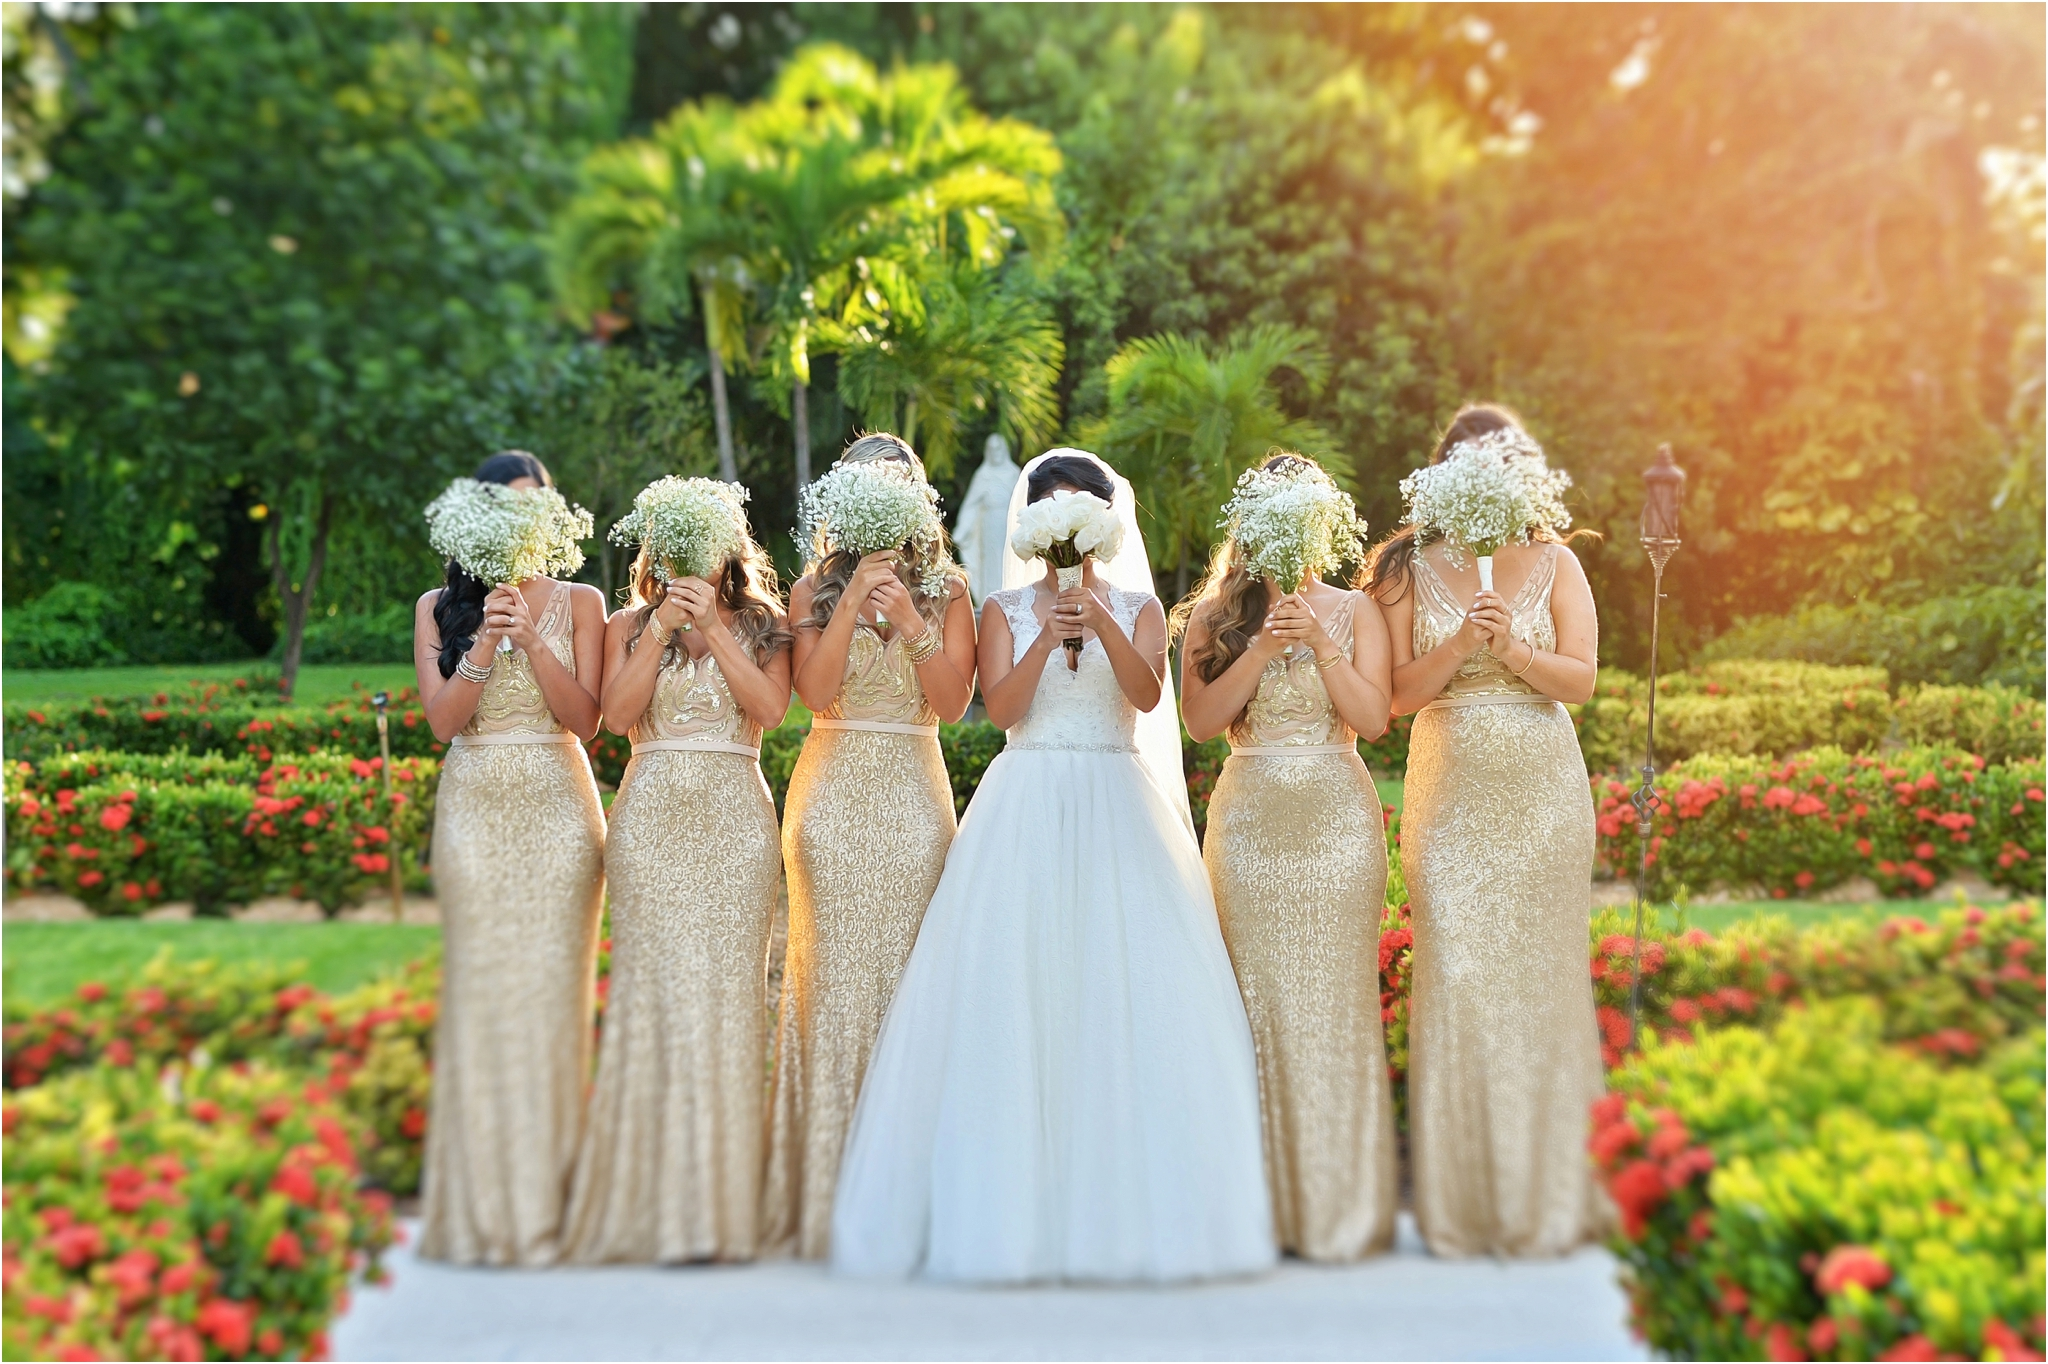 St-Francis-De-Sales-Wedding-Baro-Studios-Photography_0033.jpg